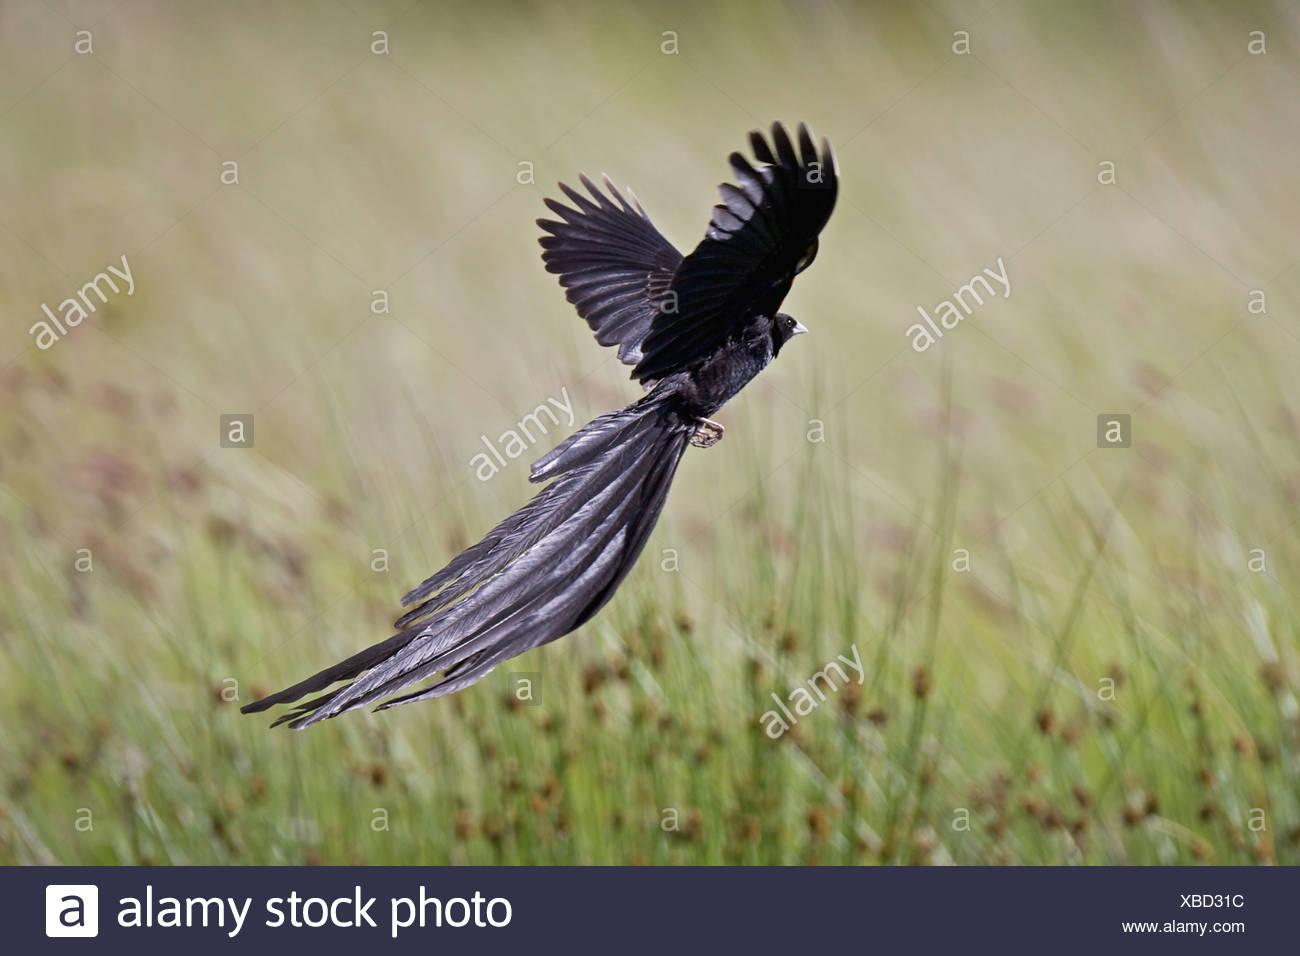 Long-tailed Widowbird (Euplectes progne), Naude's Pass, Eastern Cape Province, South Africa - Stock Image